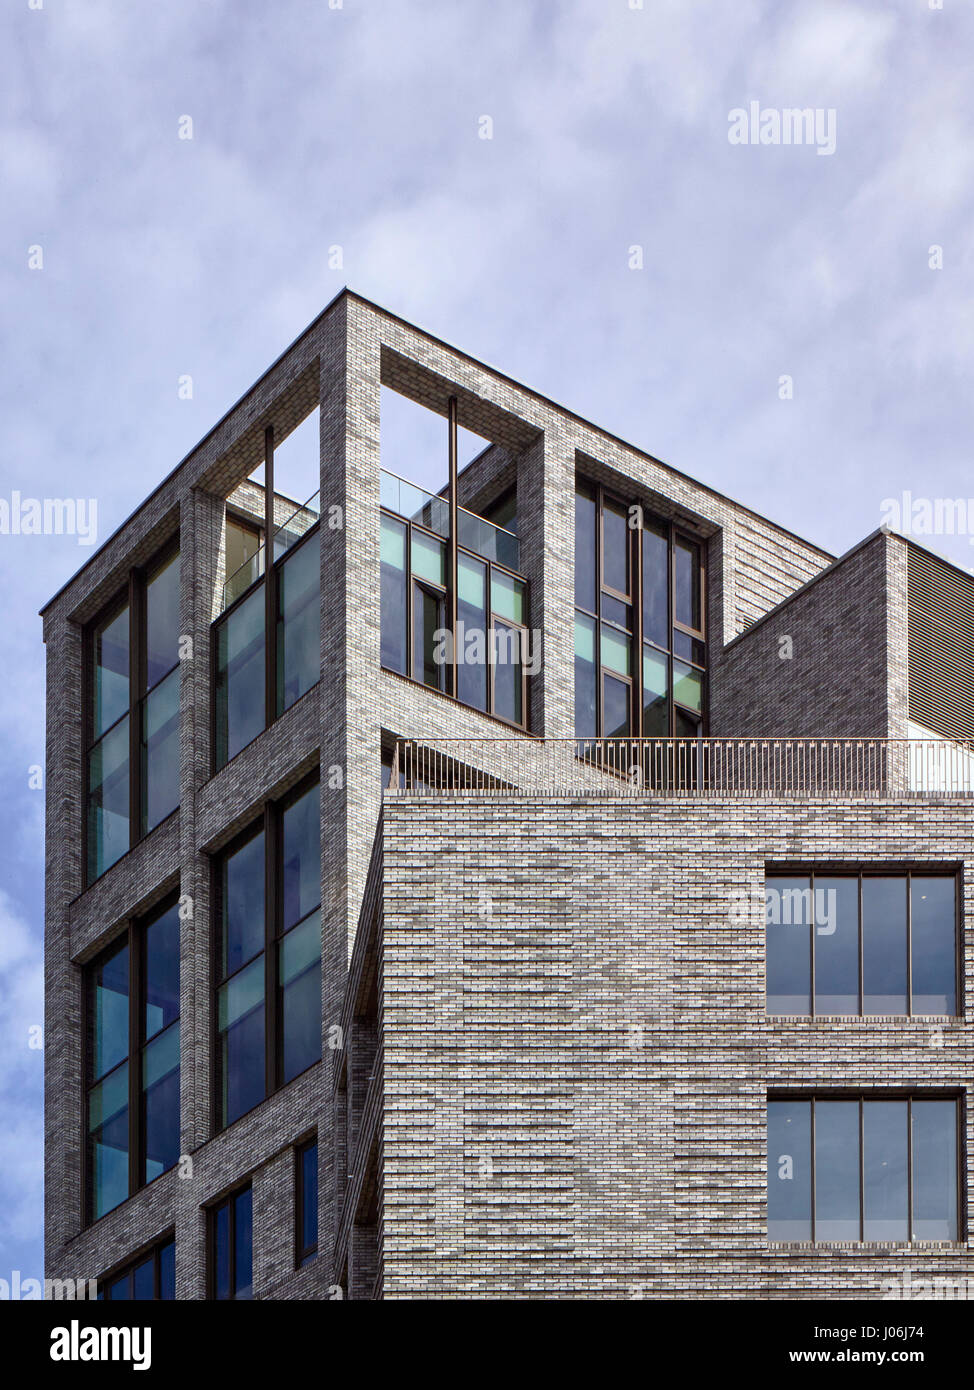 Lantern. 55 Victoria Street, London, United Kingdom. Architect: Stiff + Trevillion Architects, 2016. - Stock Image